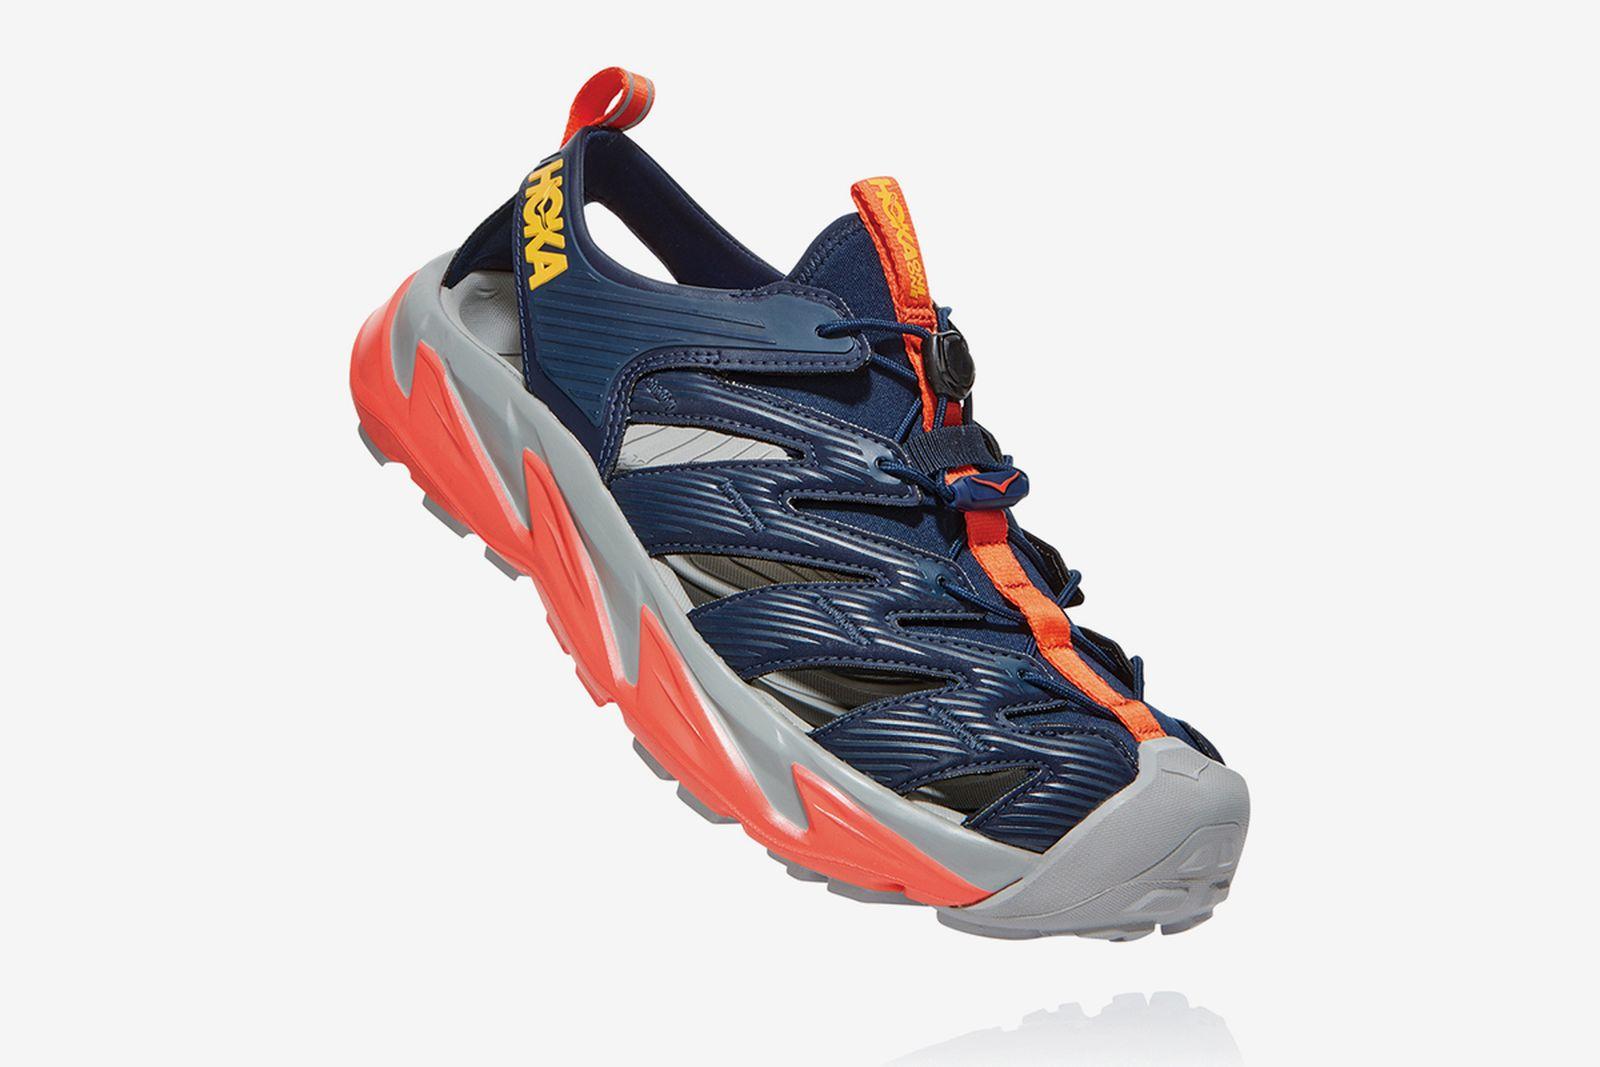 best technical sneakers outdoor retailer Adidas Hi-Tec Hoka One One